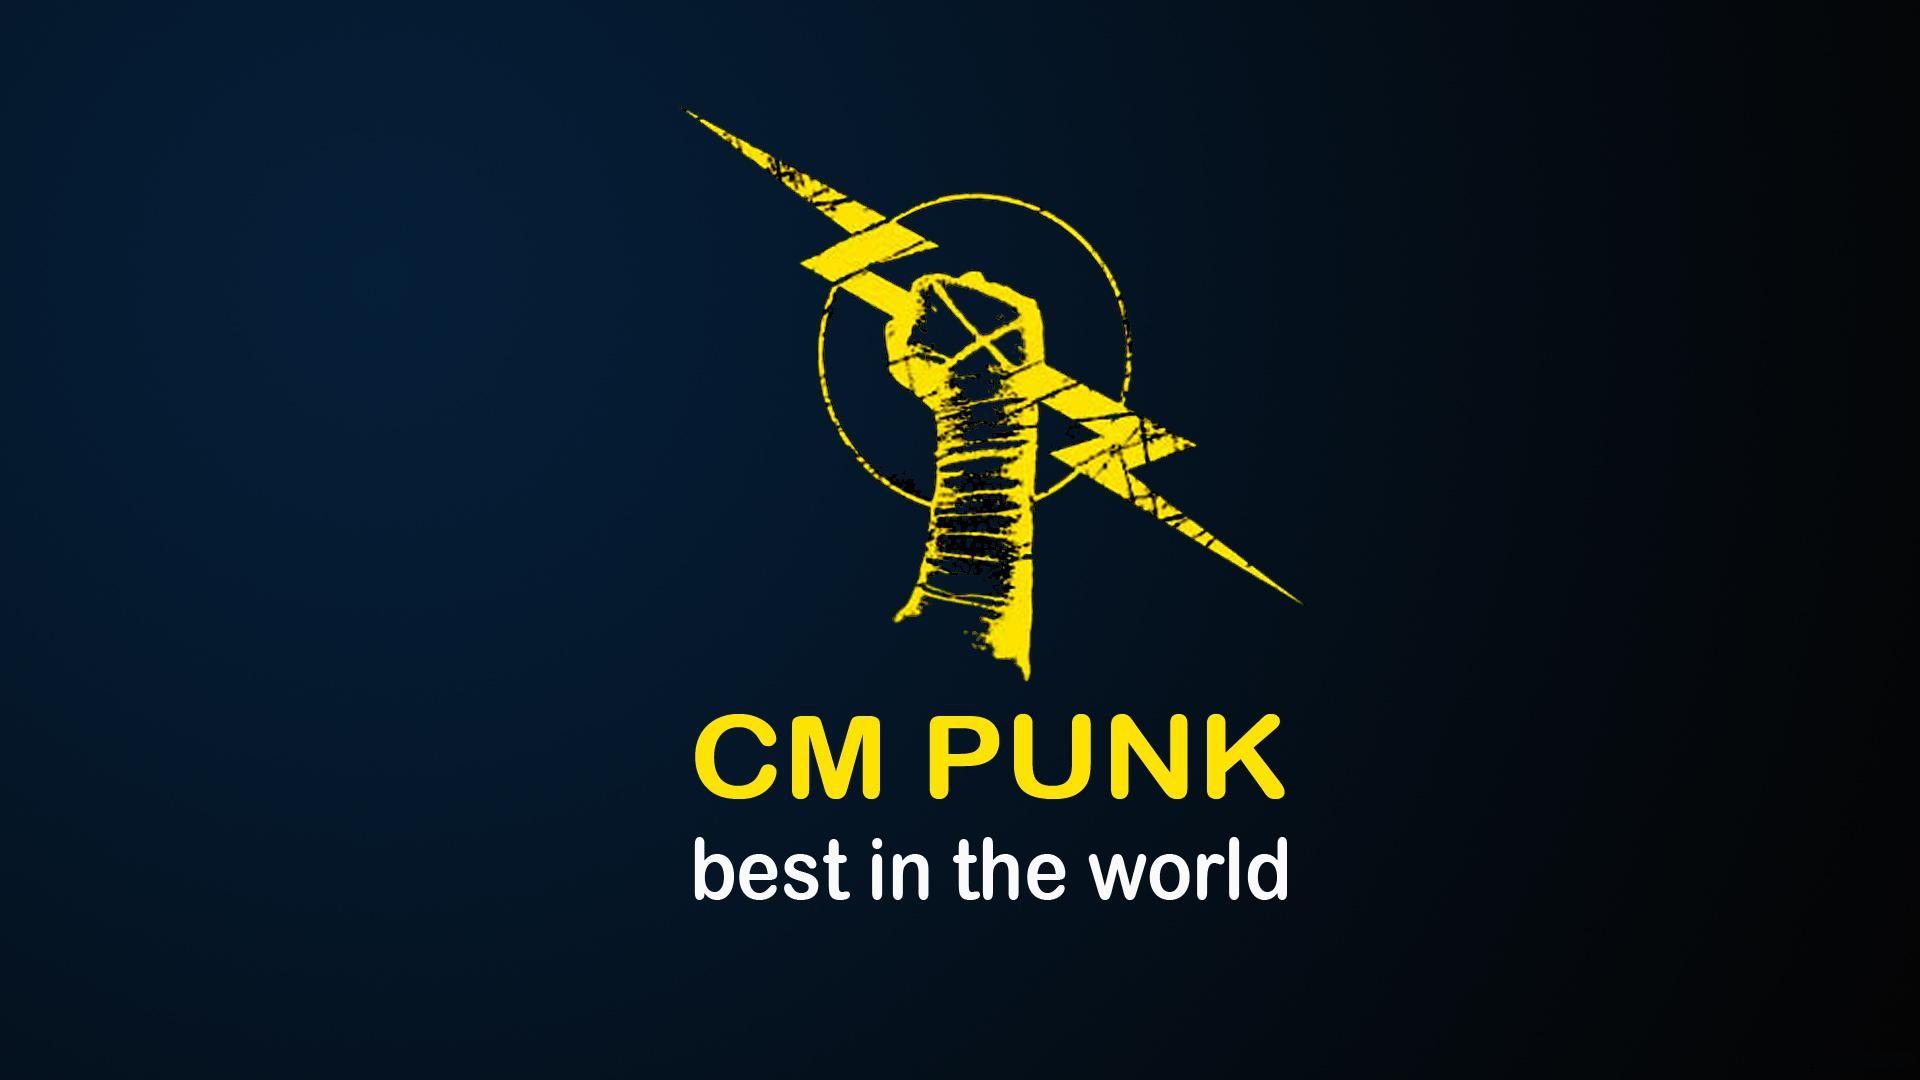 Cm Punk Photos.